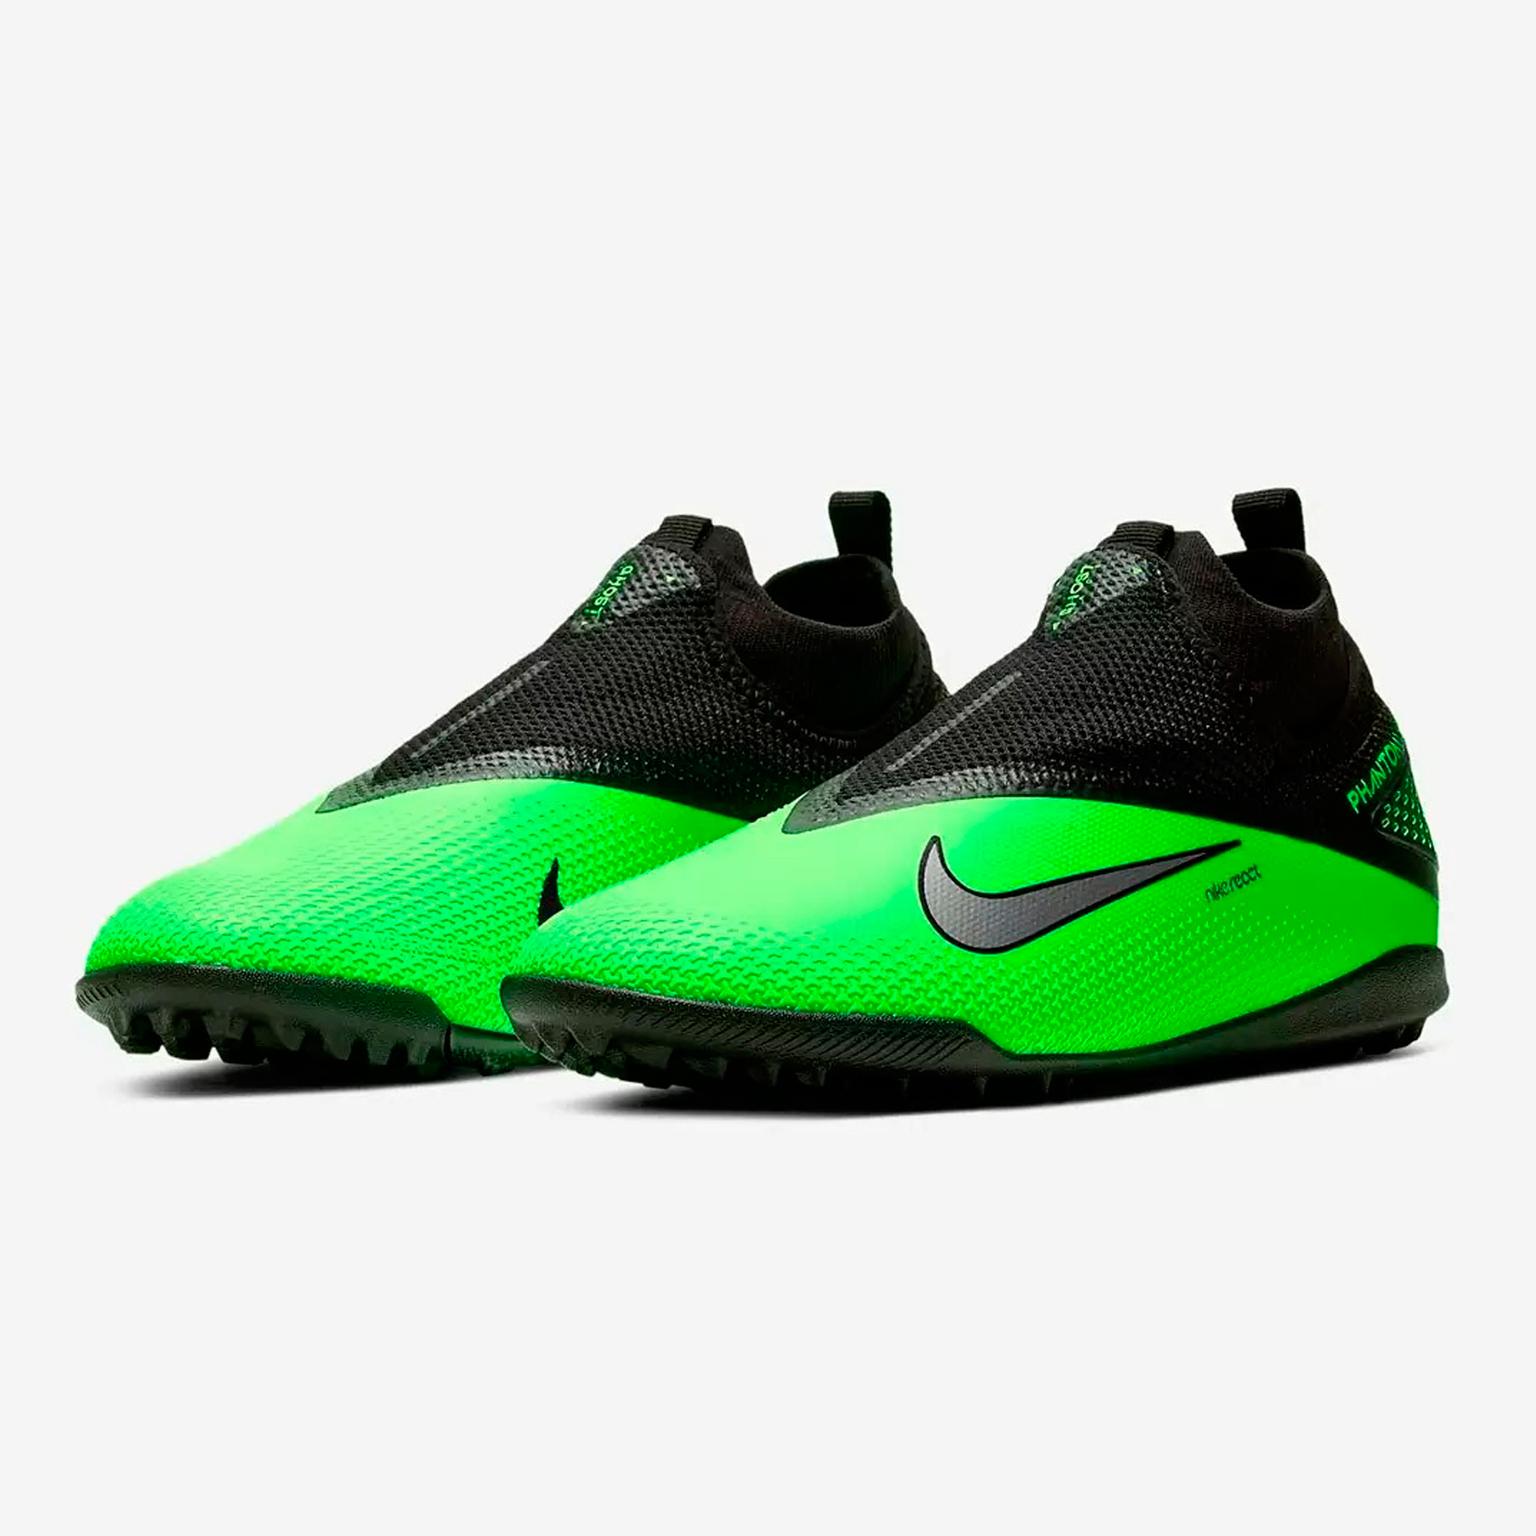 Шиповки Nike React Phantom Vision 2 Pro DF TF CD4174-036 шиповки детские nike phantom vision 2 academy df tf cd4078 606